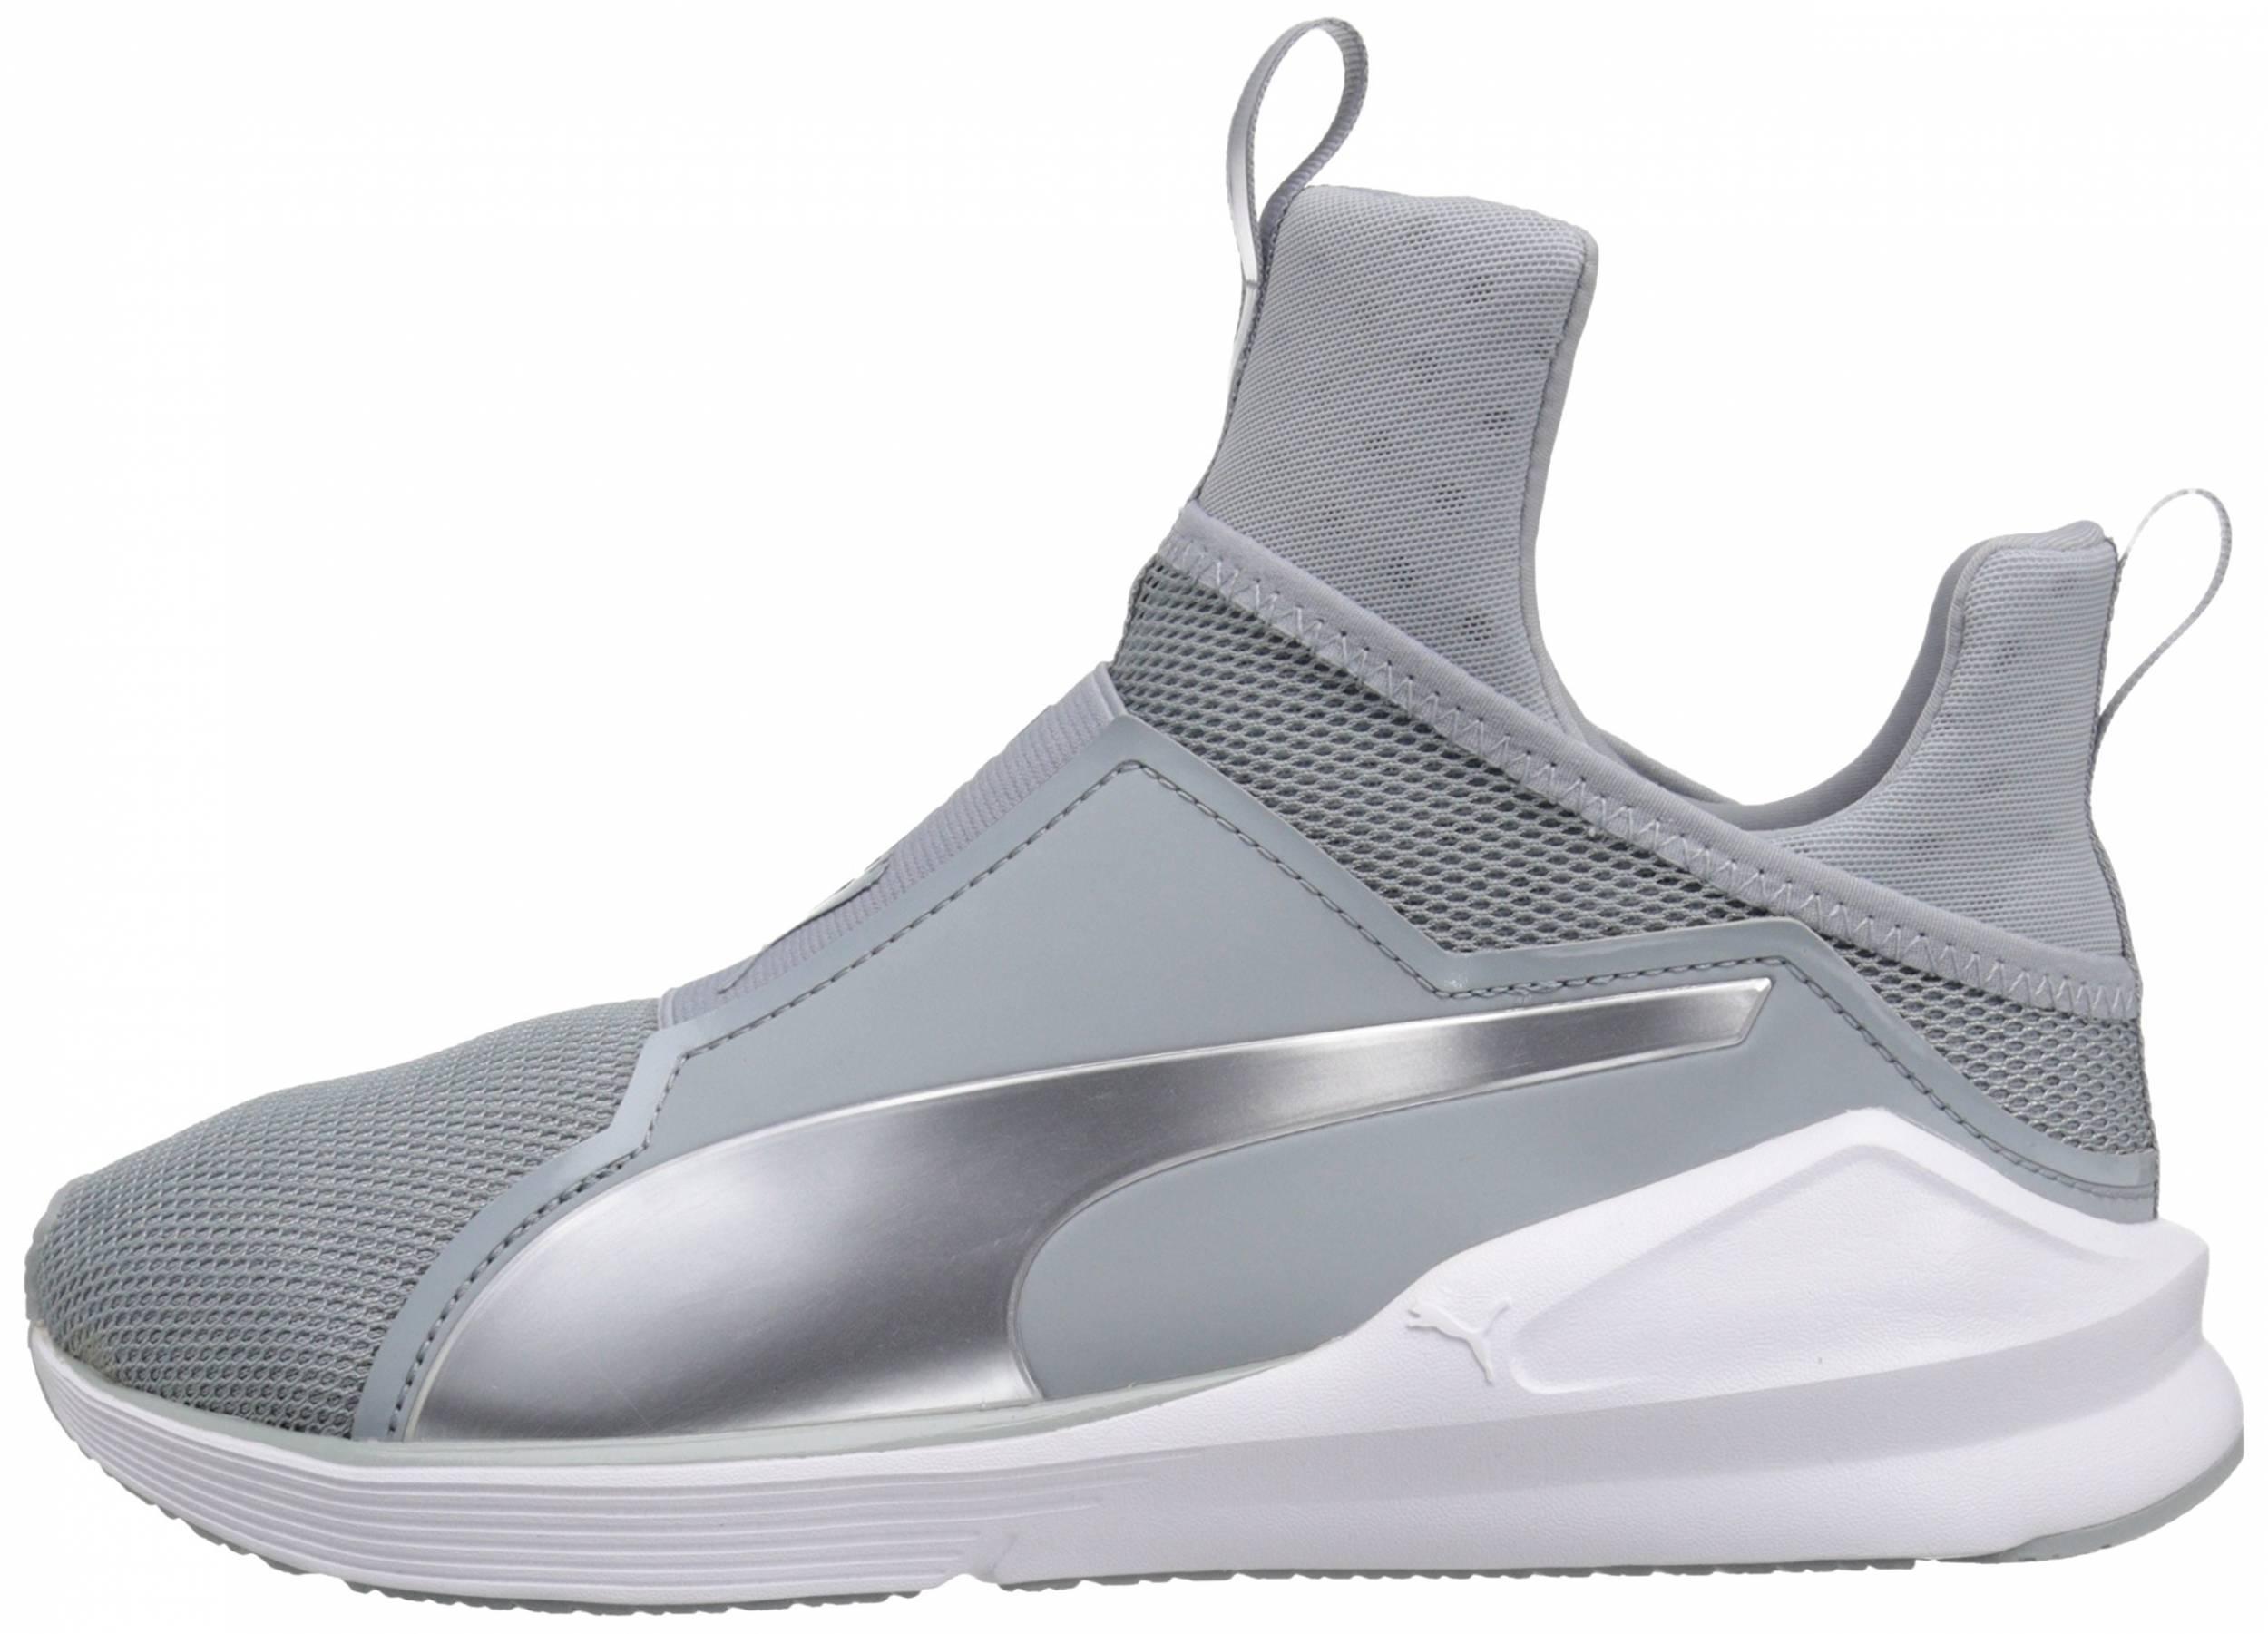 Puma Fierce Core sneakers in black grey (only $55) | RunRepeat